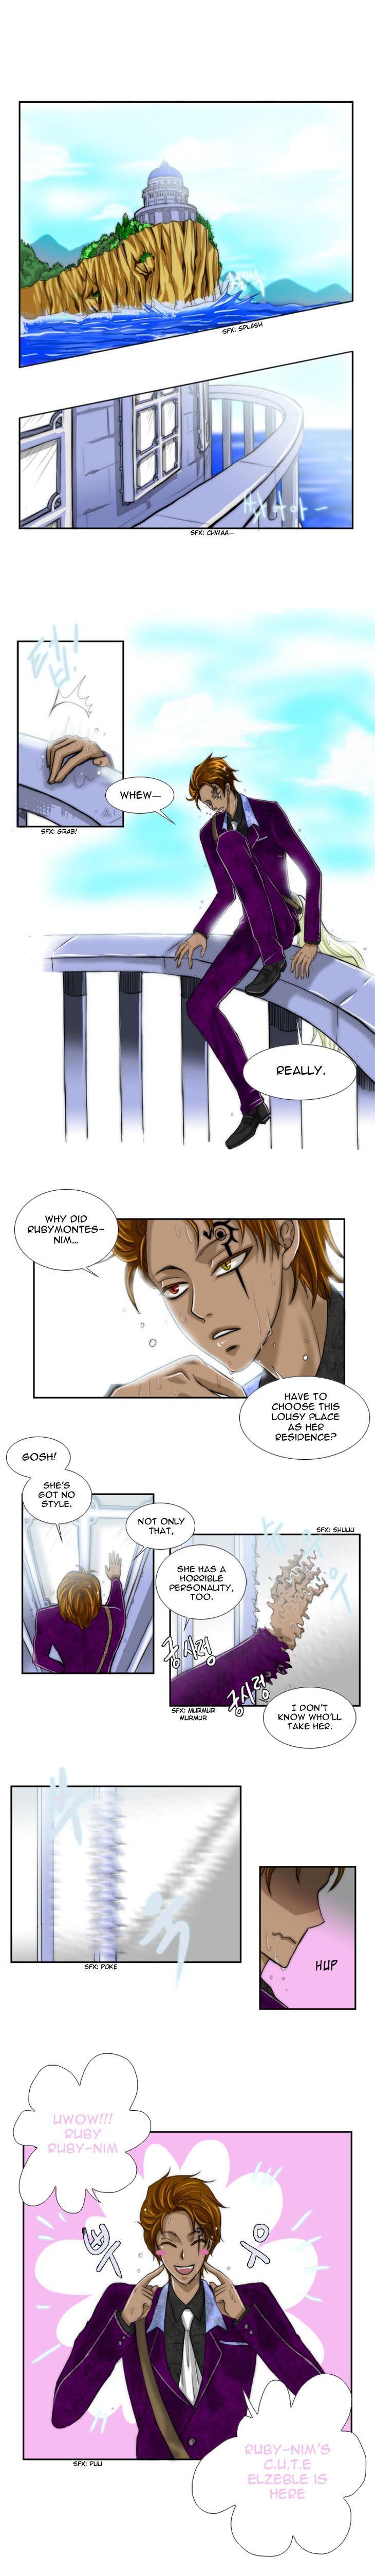 Black Haze 12 Page 1